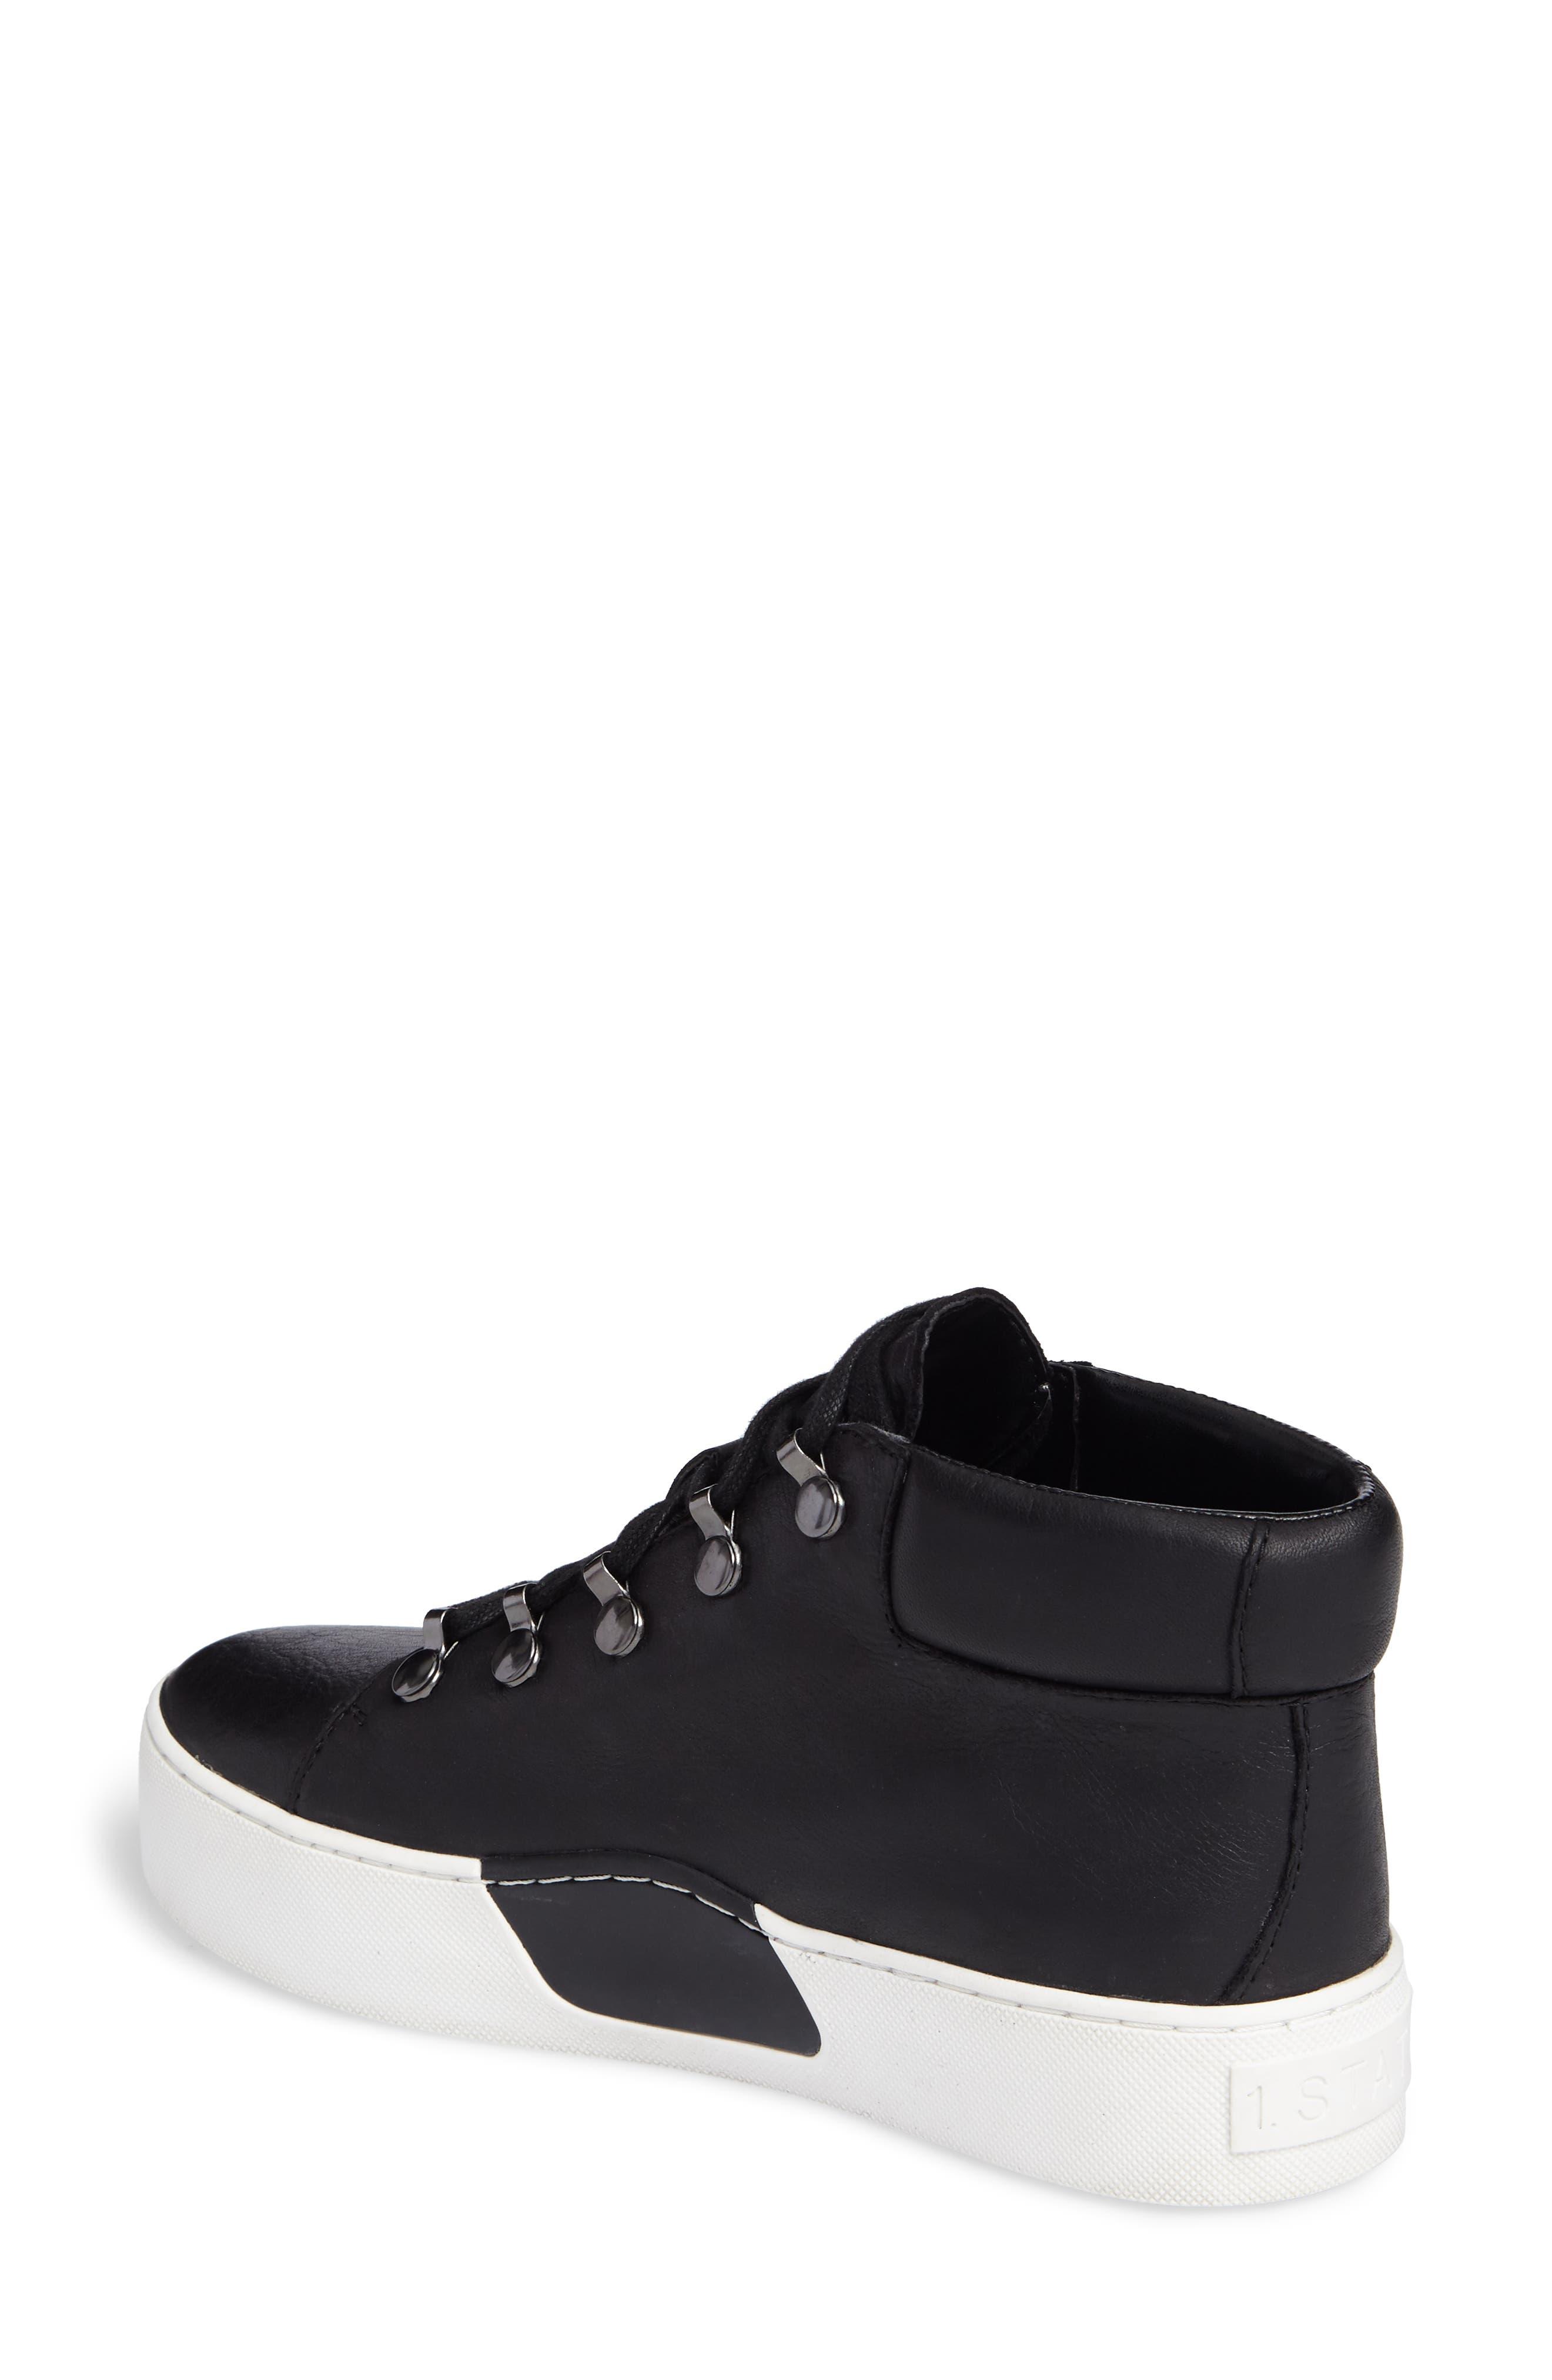 Wrine High Top Sneaker,                             Alternate thumbnail 2, color,                             001